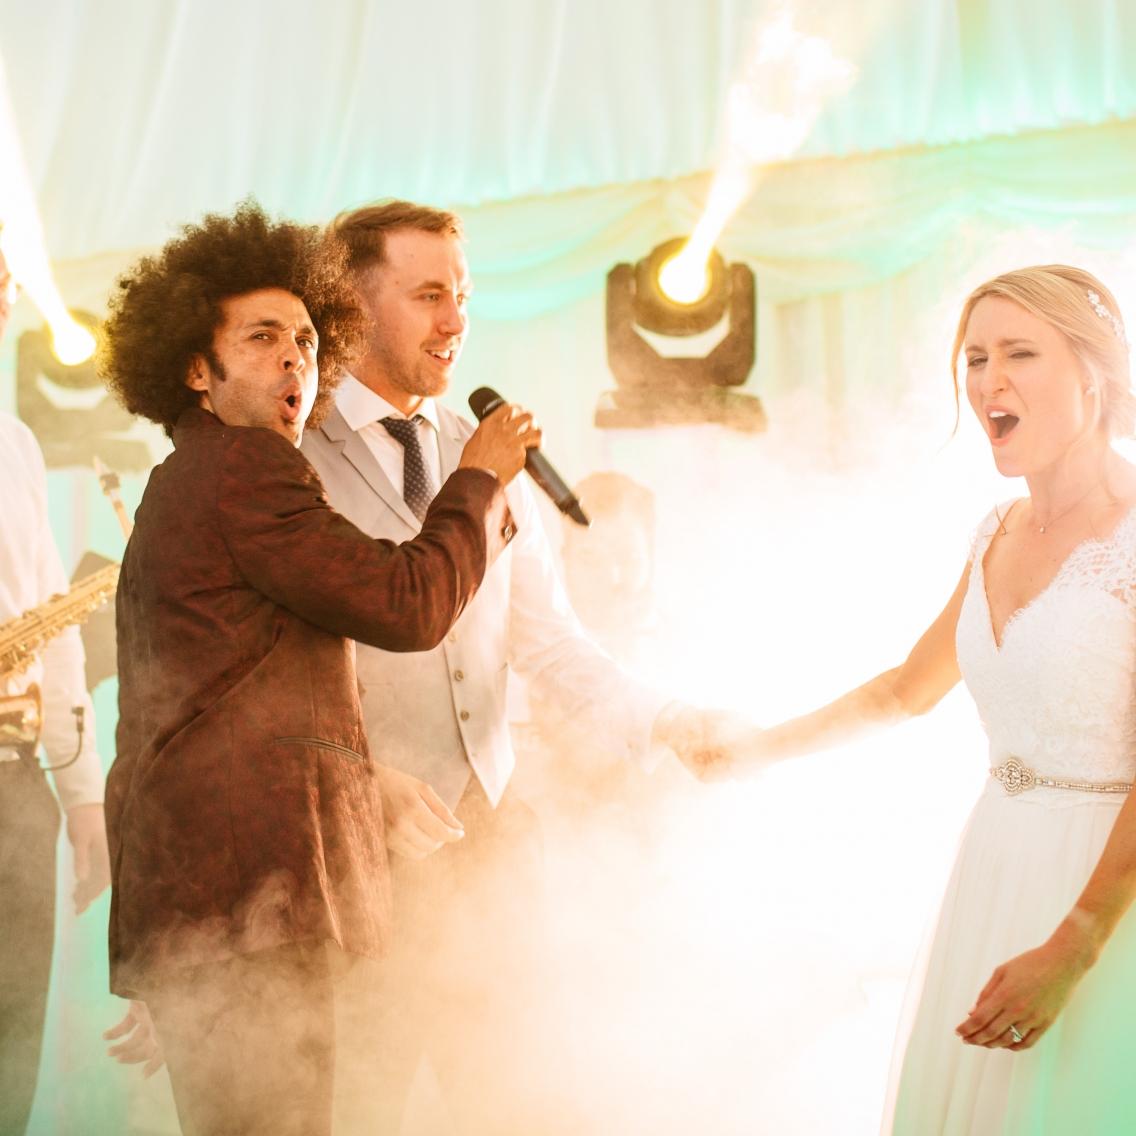 bride and groom singing at their wedding